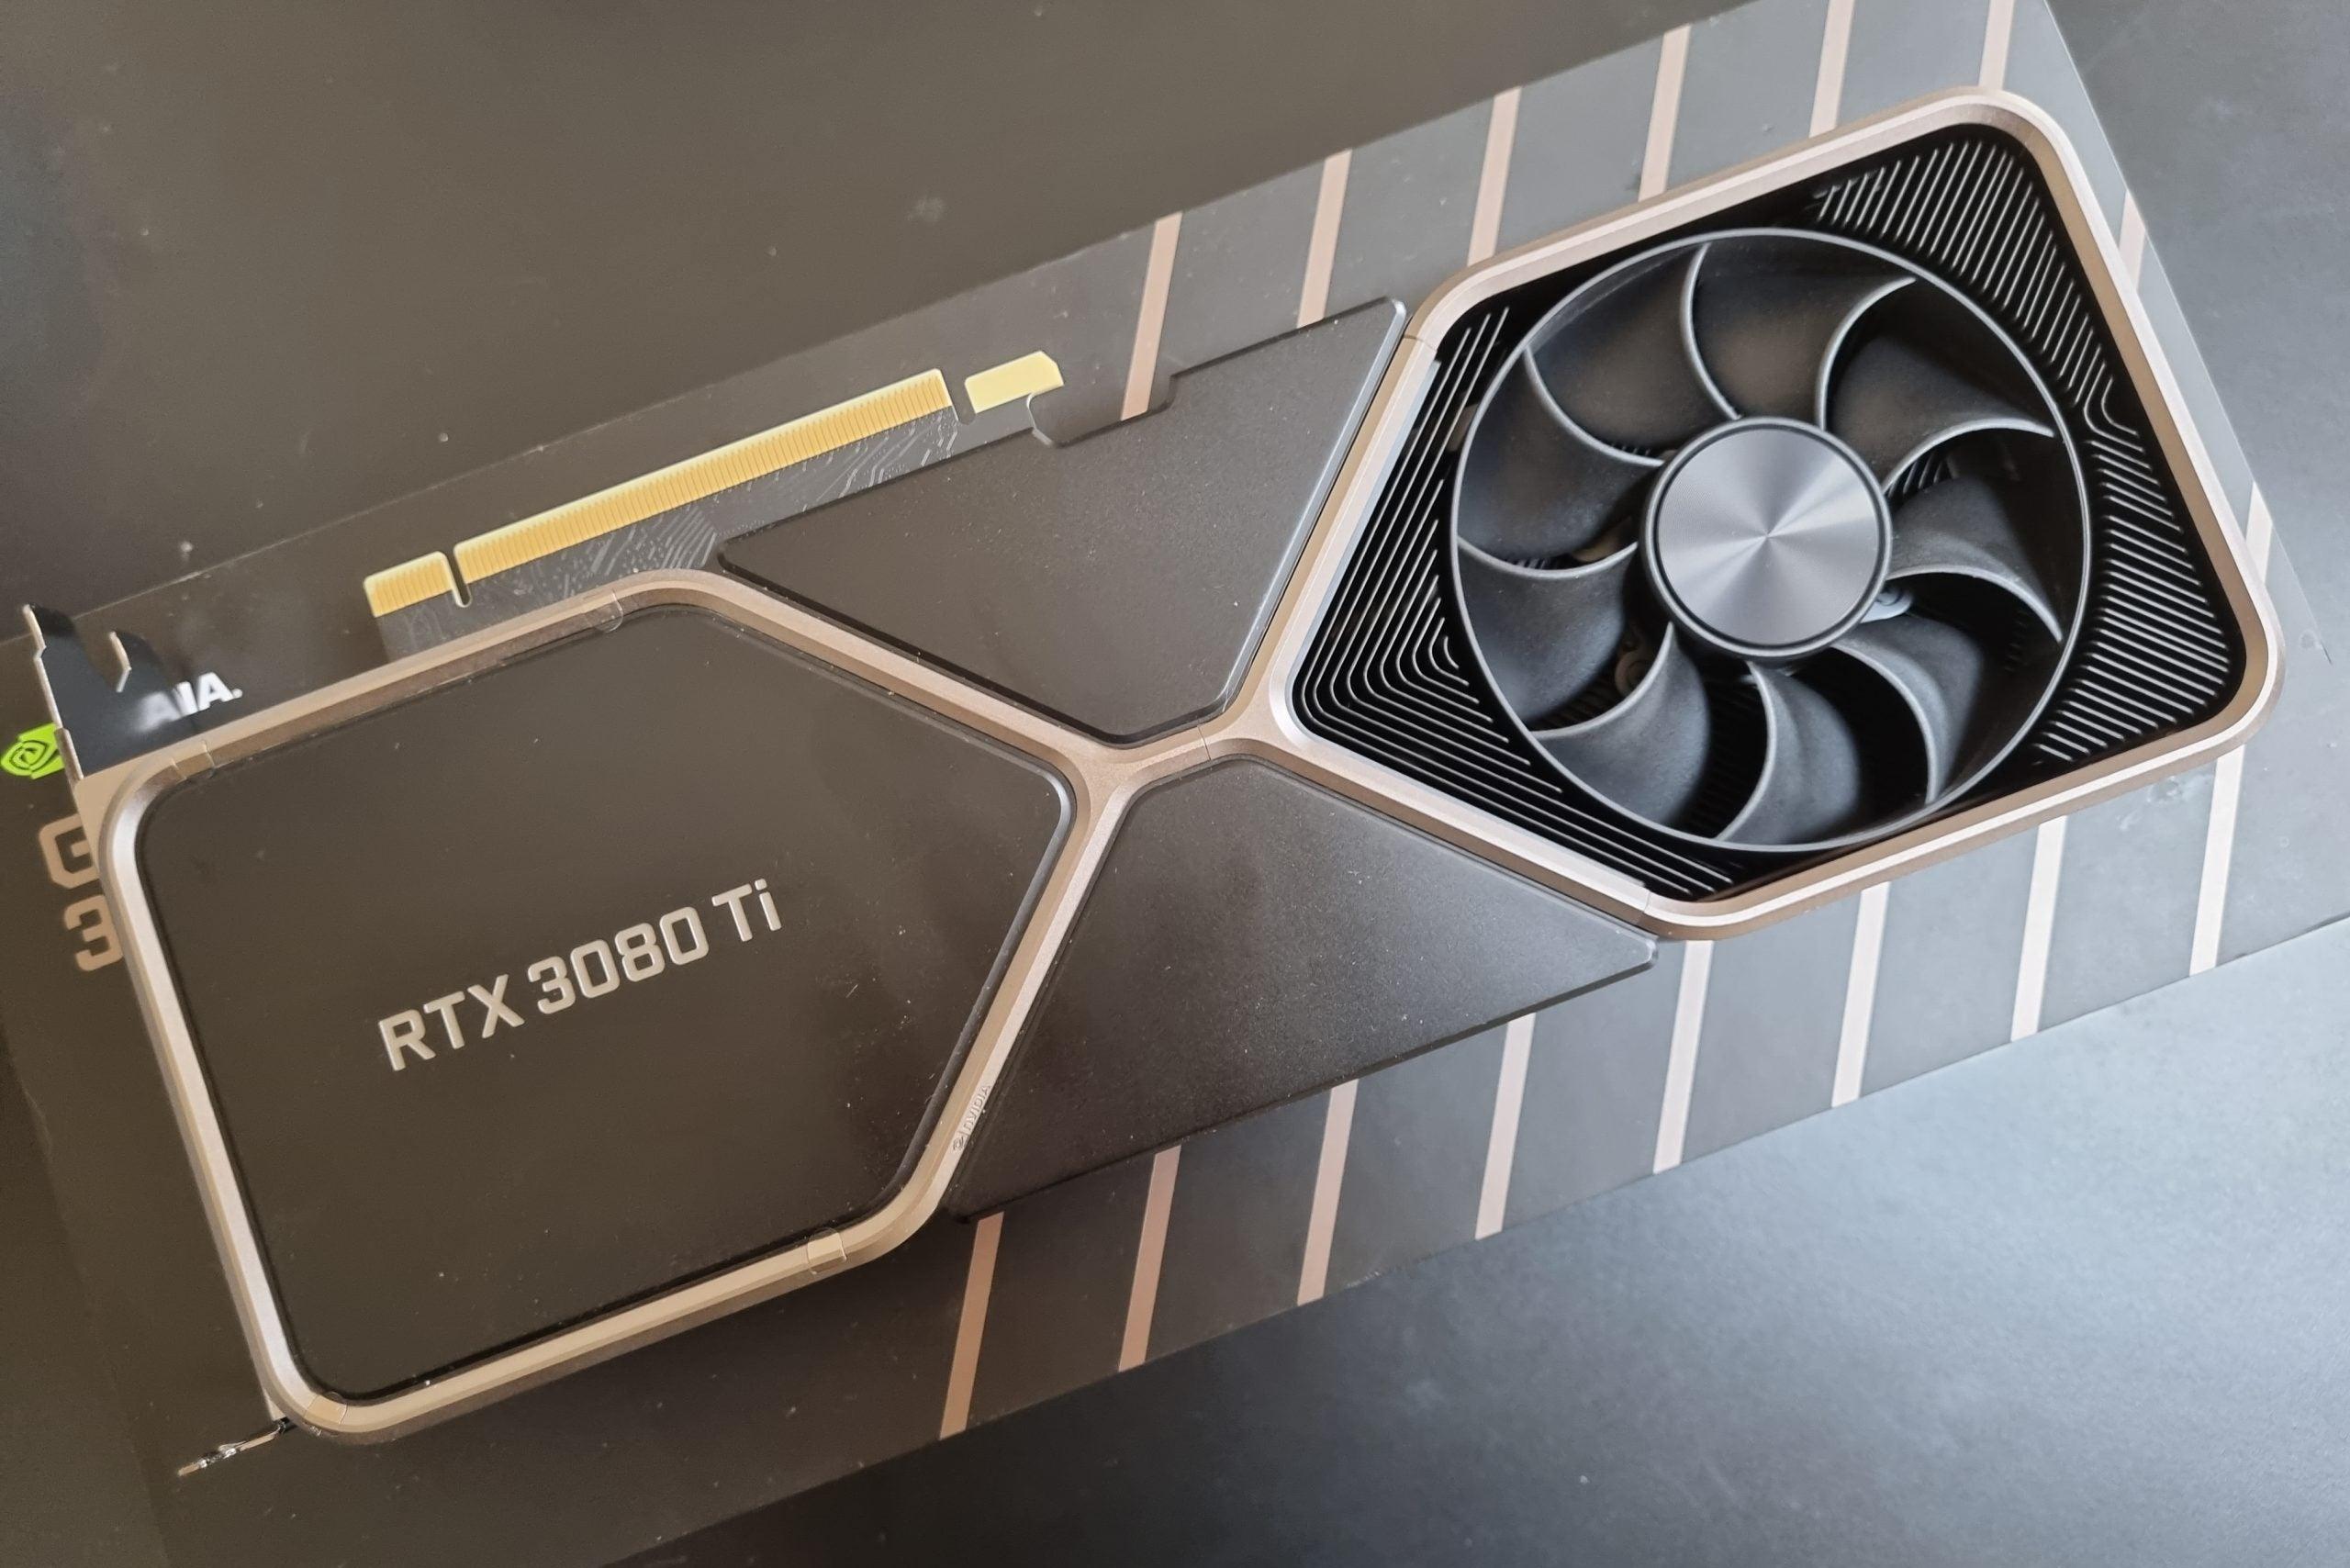 NVIDIA GeForce RTX 3080 Ti 20 GB Graphics Card